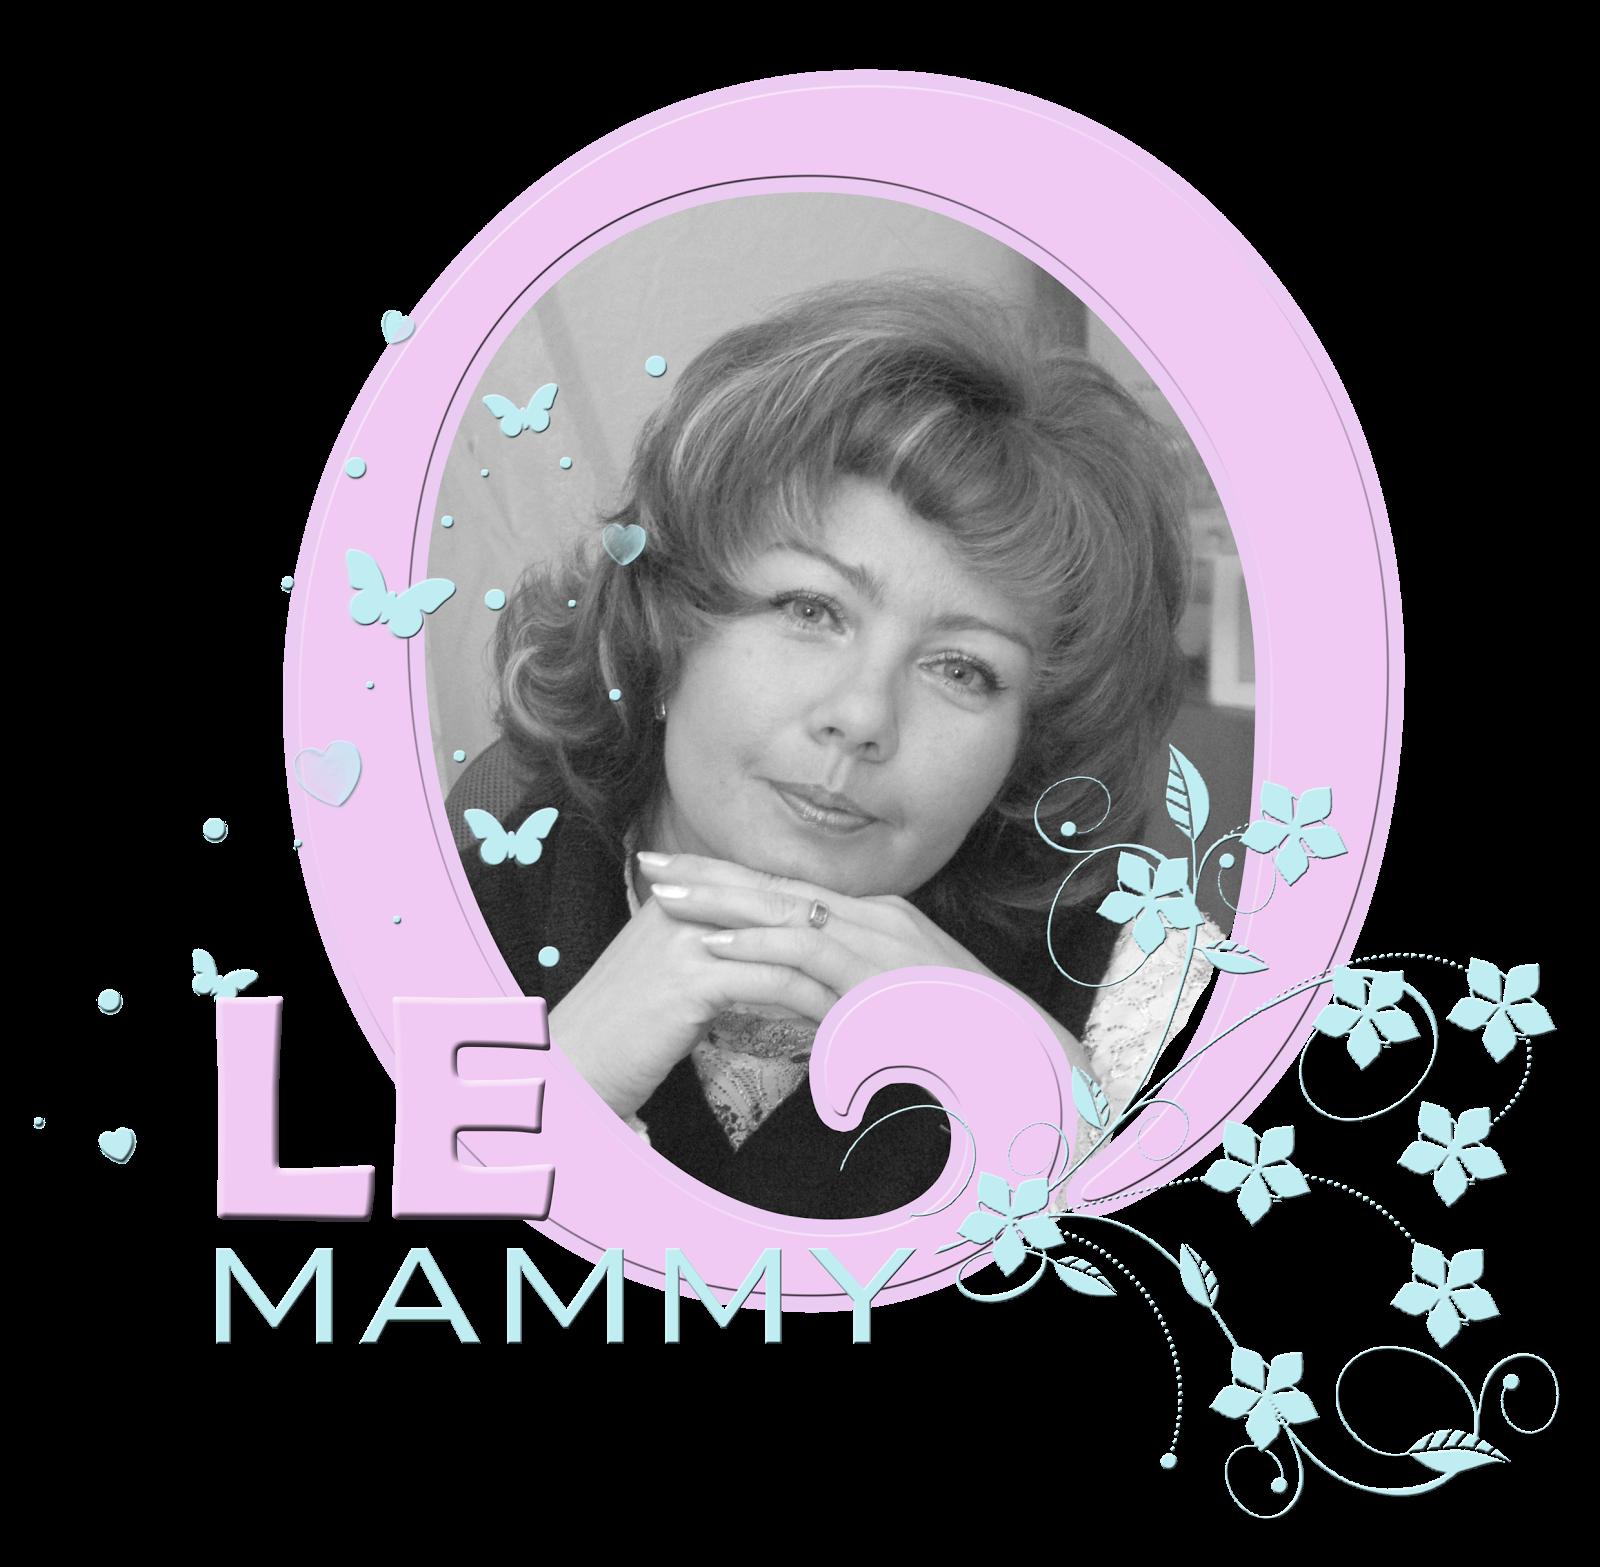 Я дизайнер LeoMammy